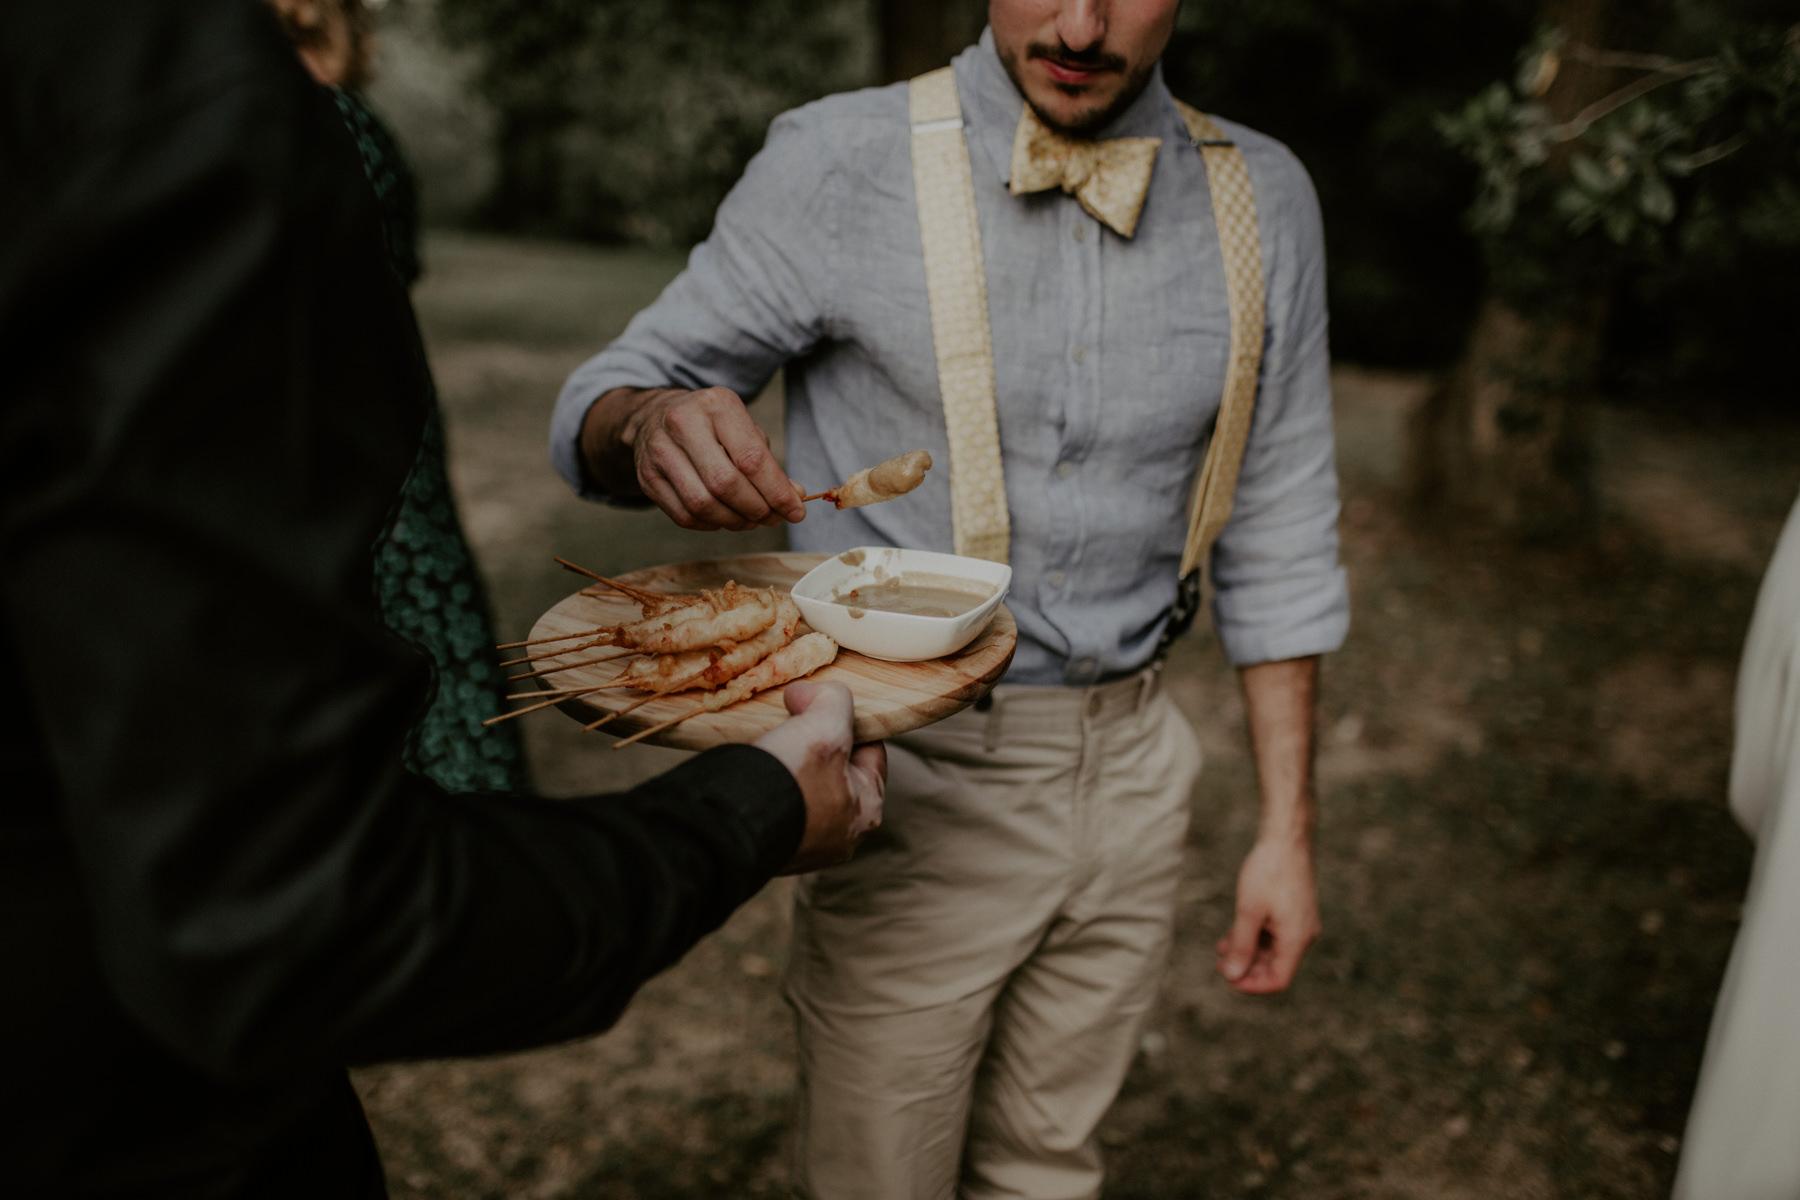 alt_thenortherngirlphotography_couples_weddingphotographer_photographer_wedding_boda_fotografodebodas_fotografobodasbarcelona_bodaindie_bodasconestilo_bodaensantperedeclara_jennifermiguel-610.jpg